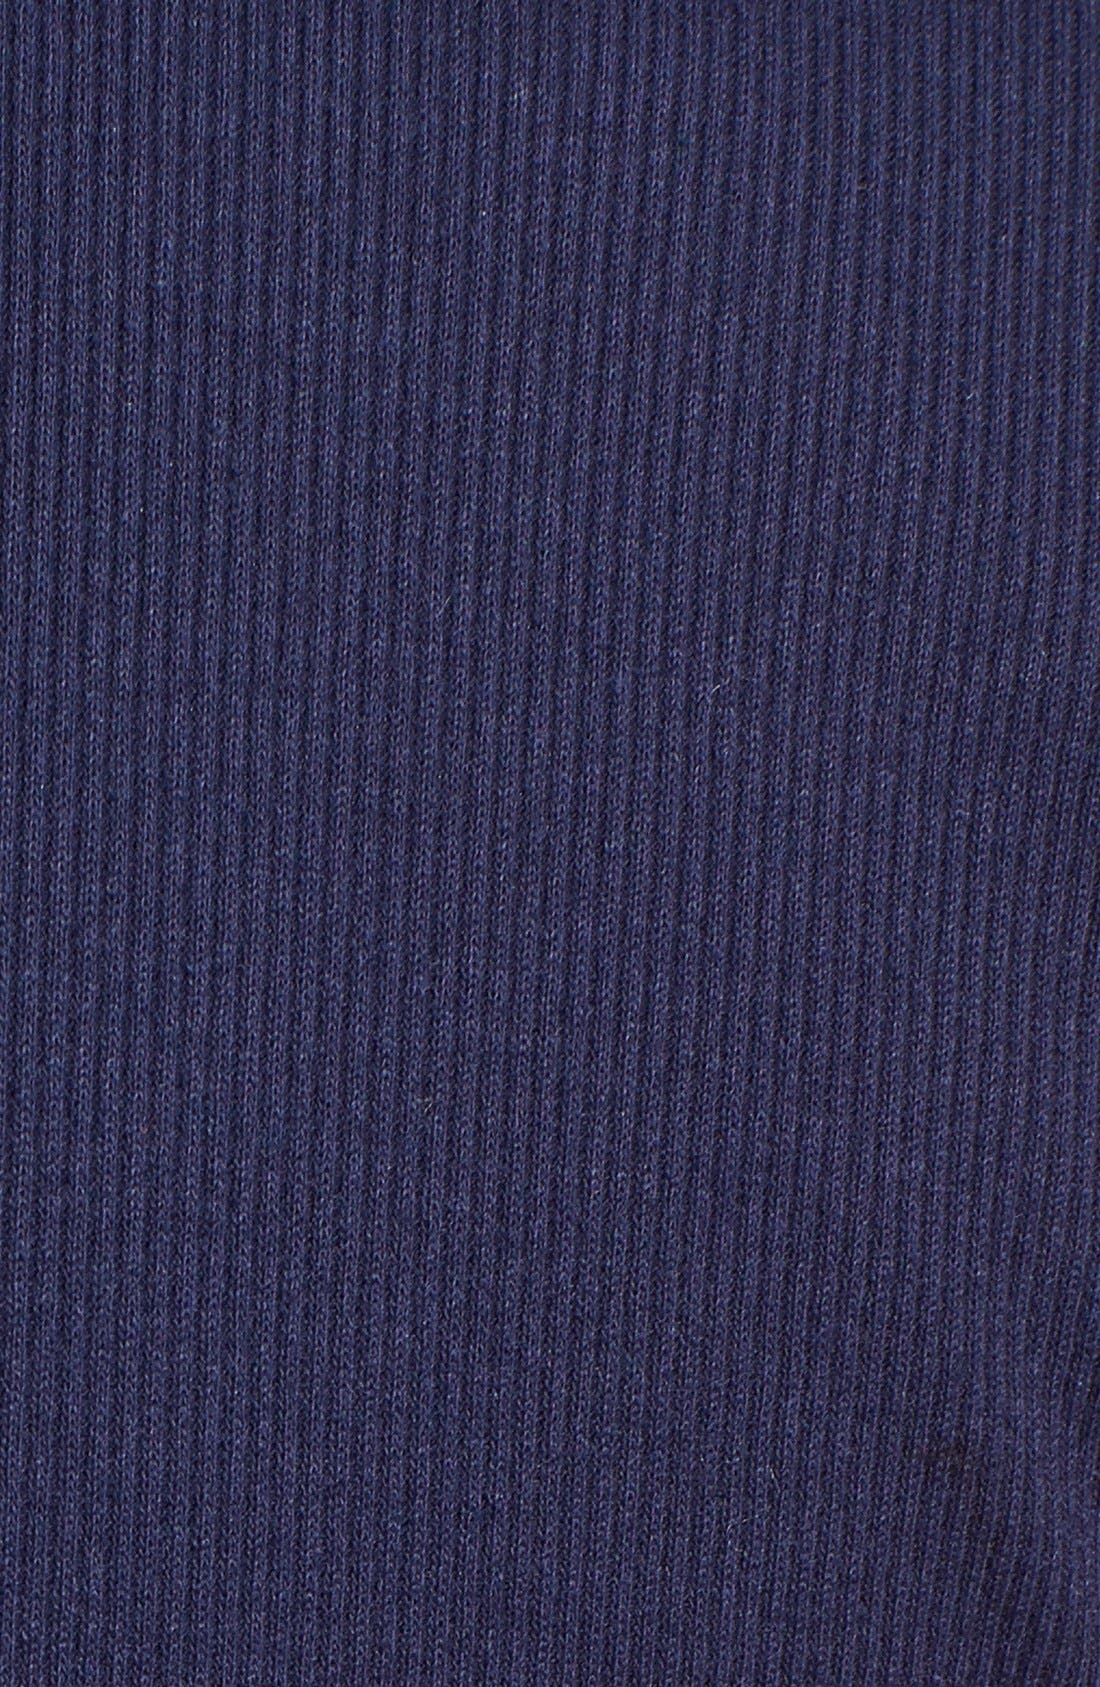 'Amber' Scoop Neck Maxi Dress,                             Alternate thumbnail 3, color,                             Navy